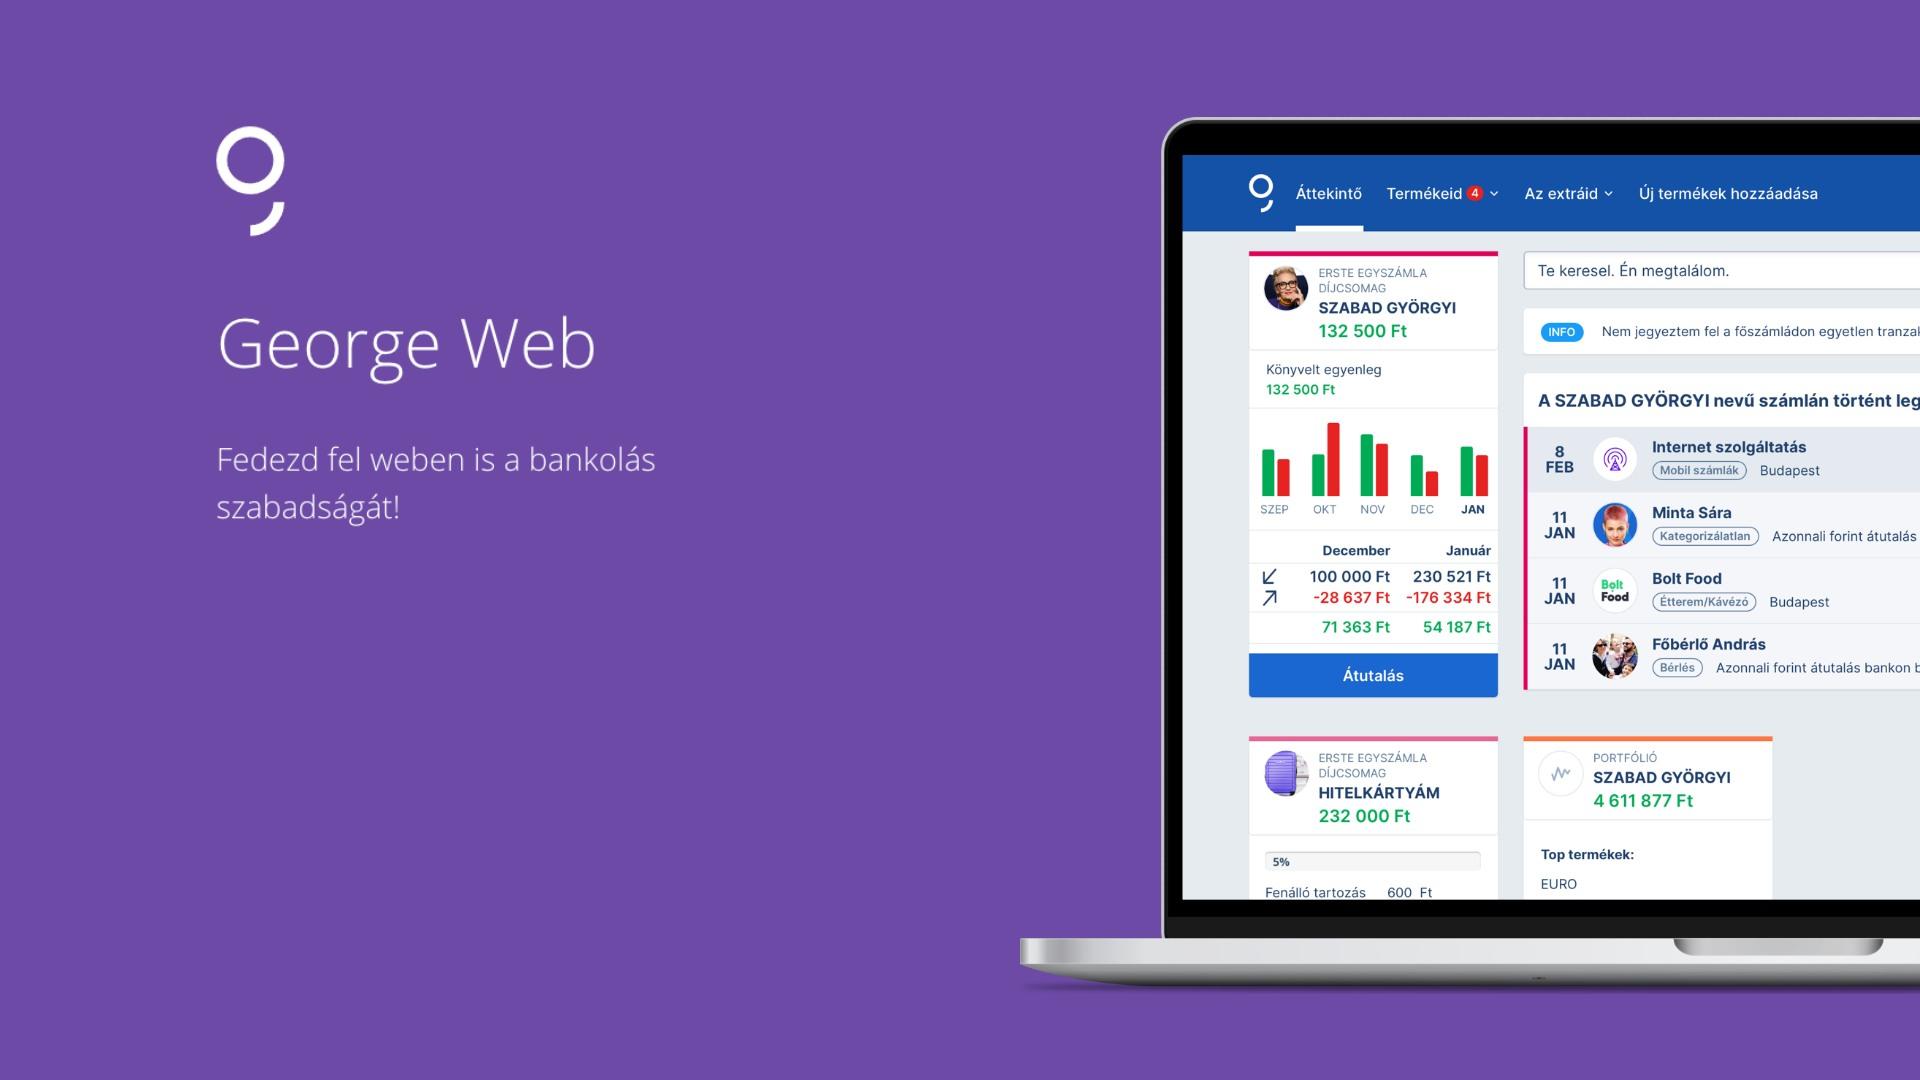 erste bank george web